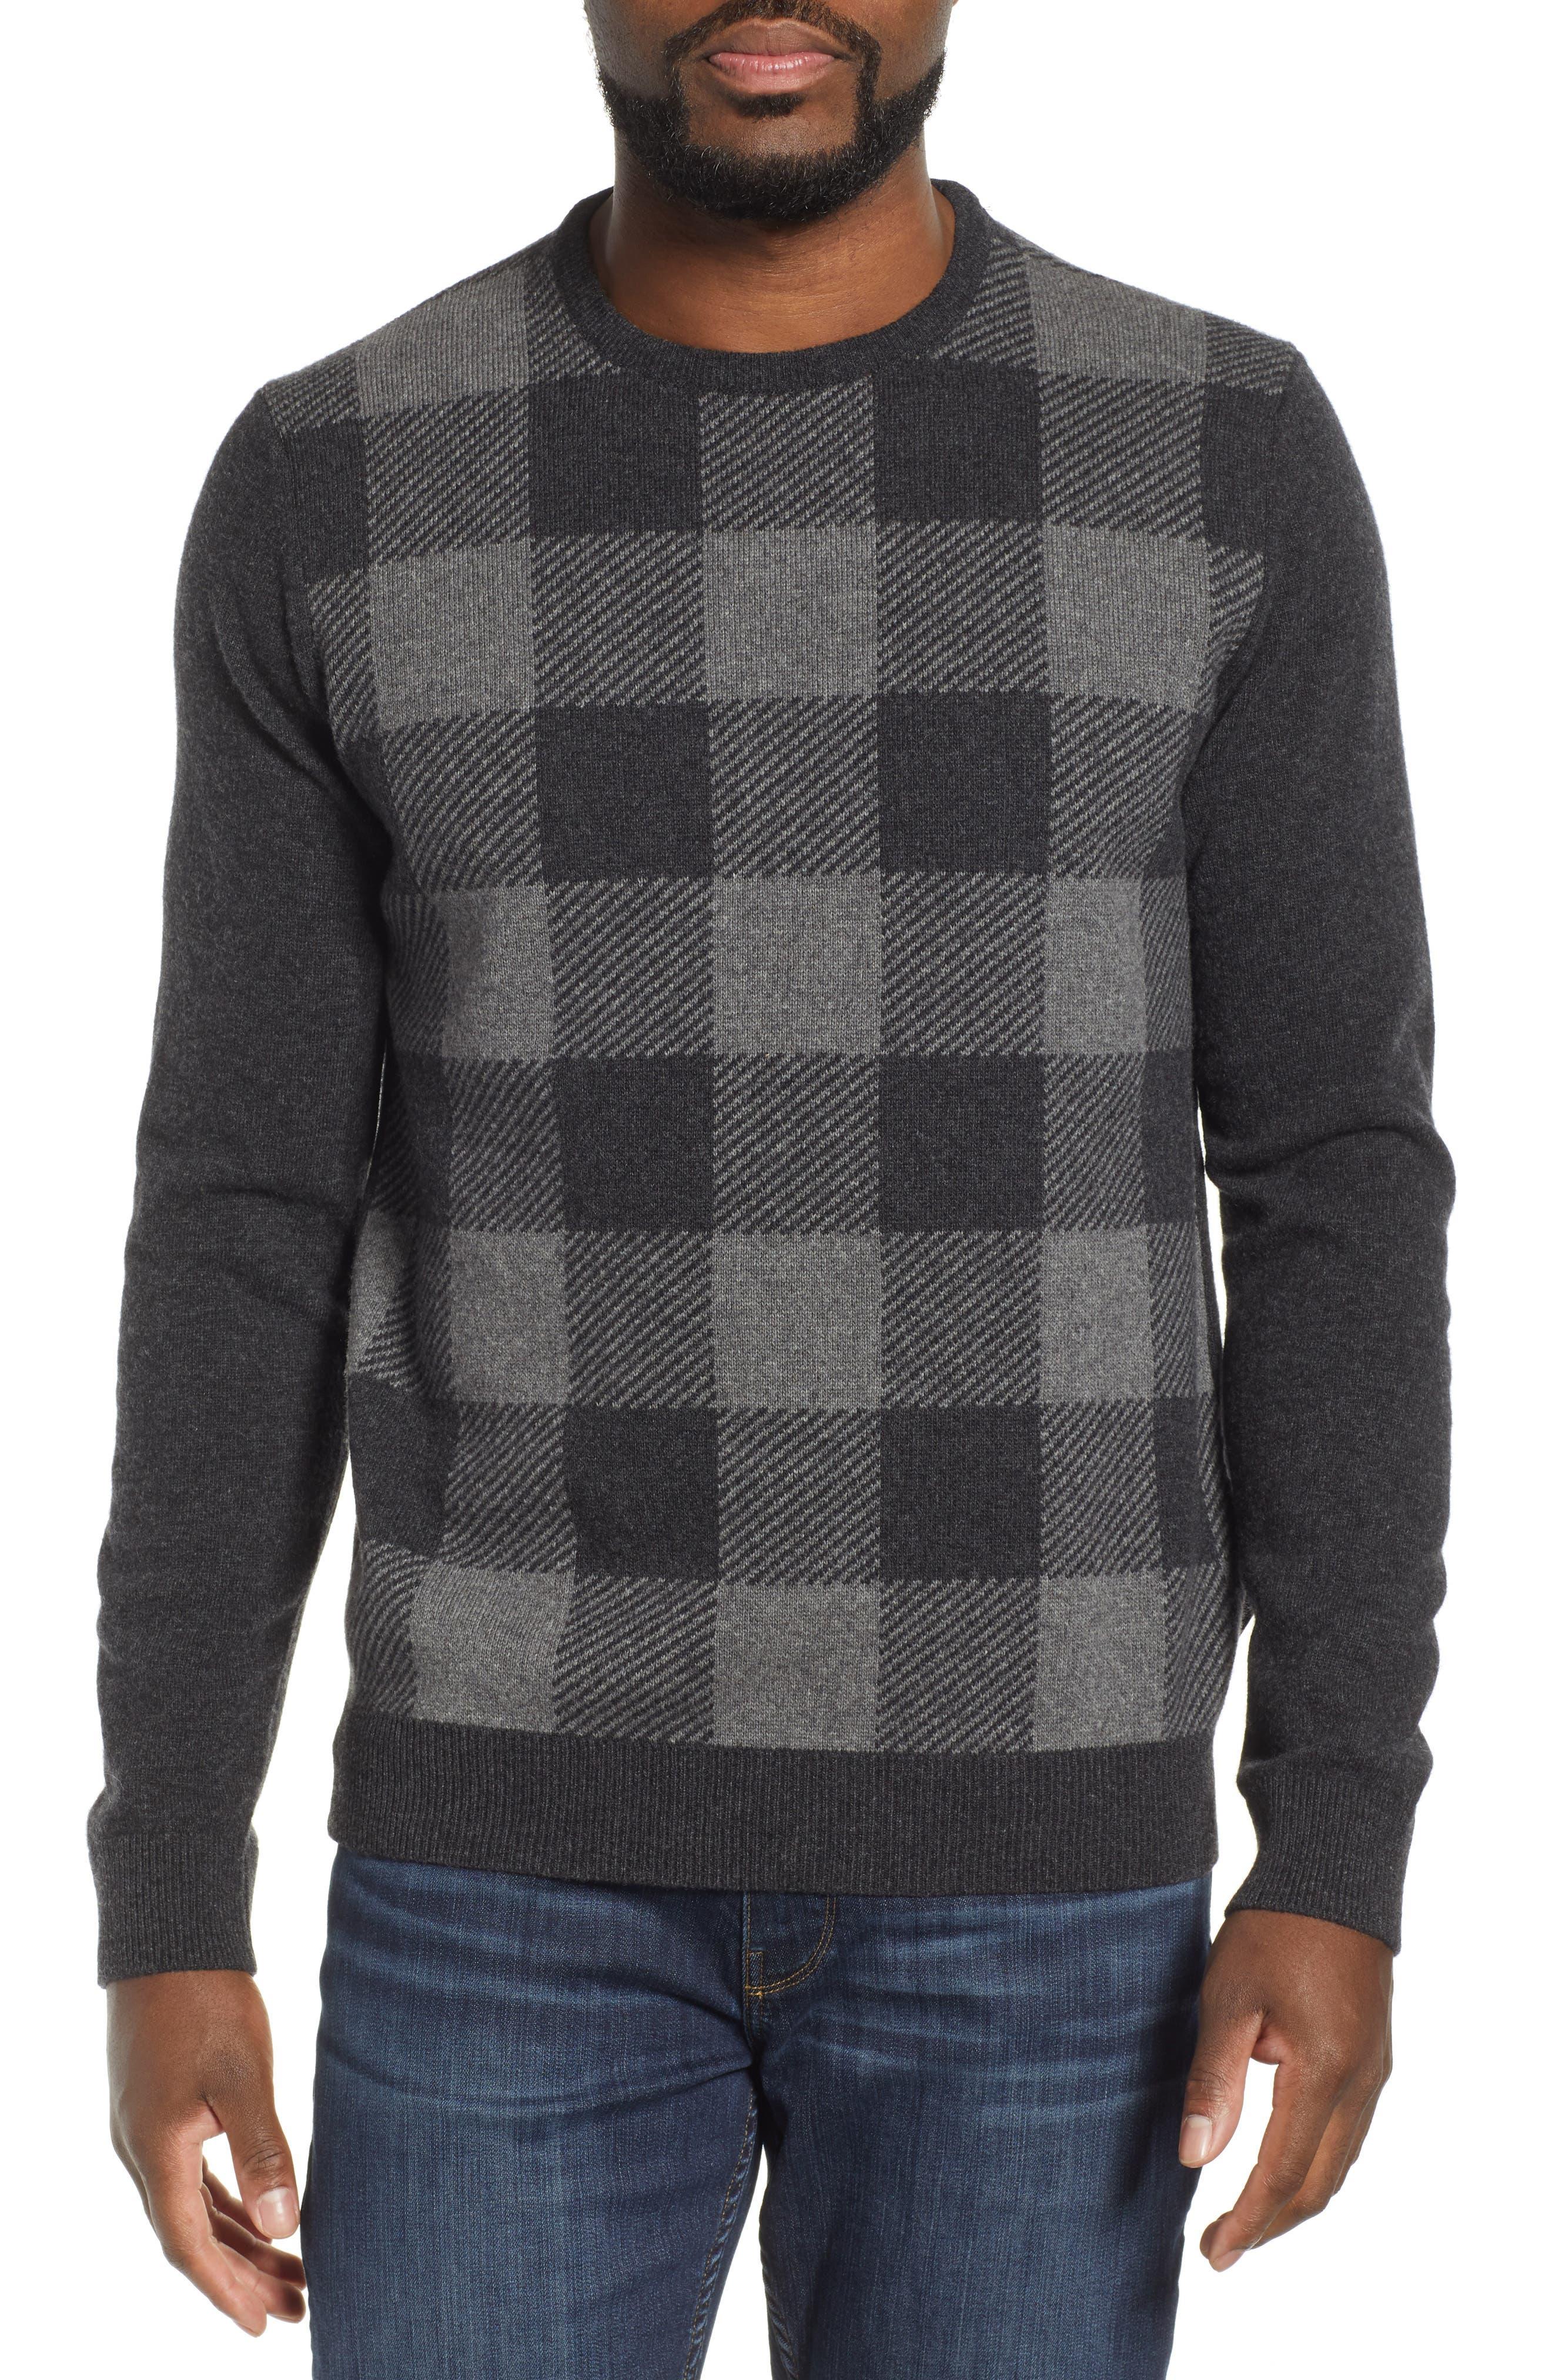 Barbour Buffalo Check Crewneck Sweater, Grey